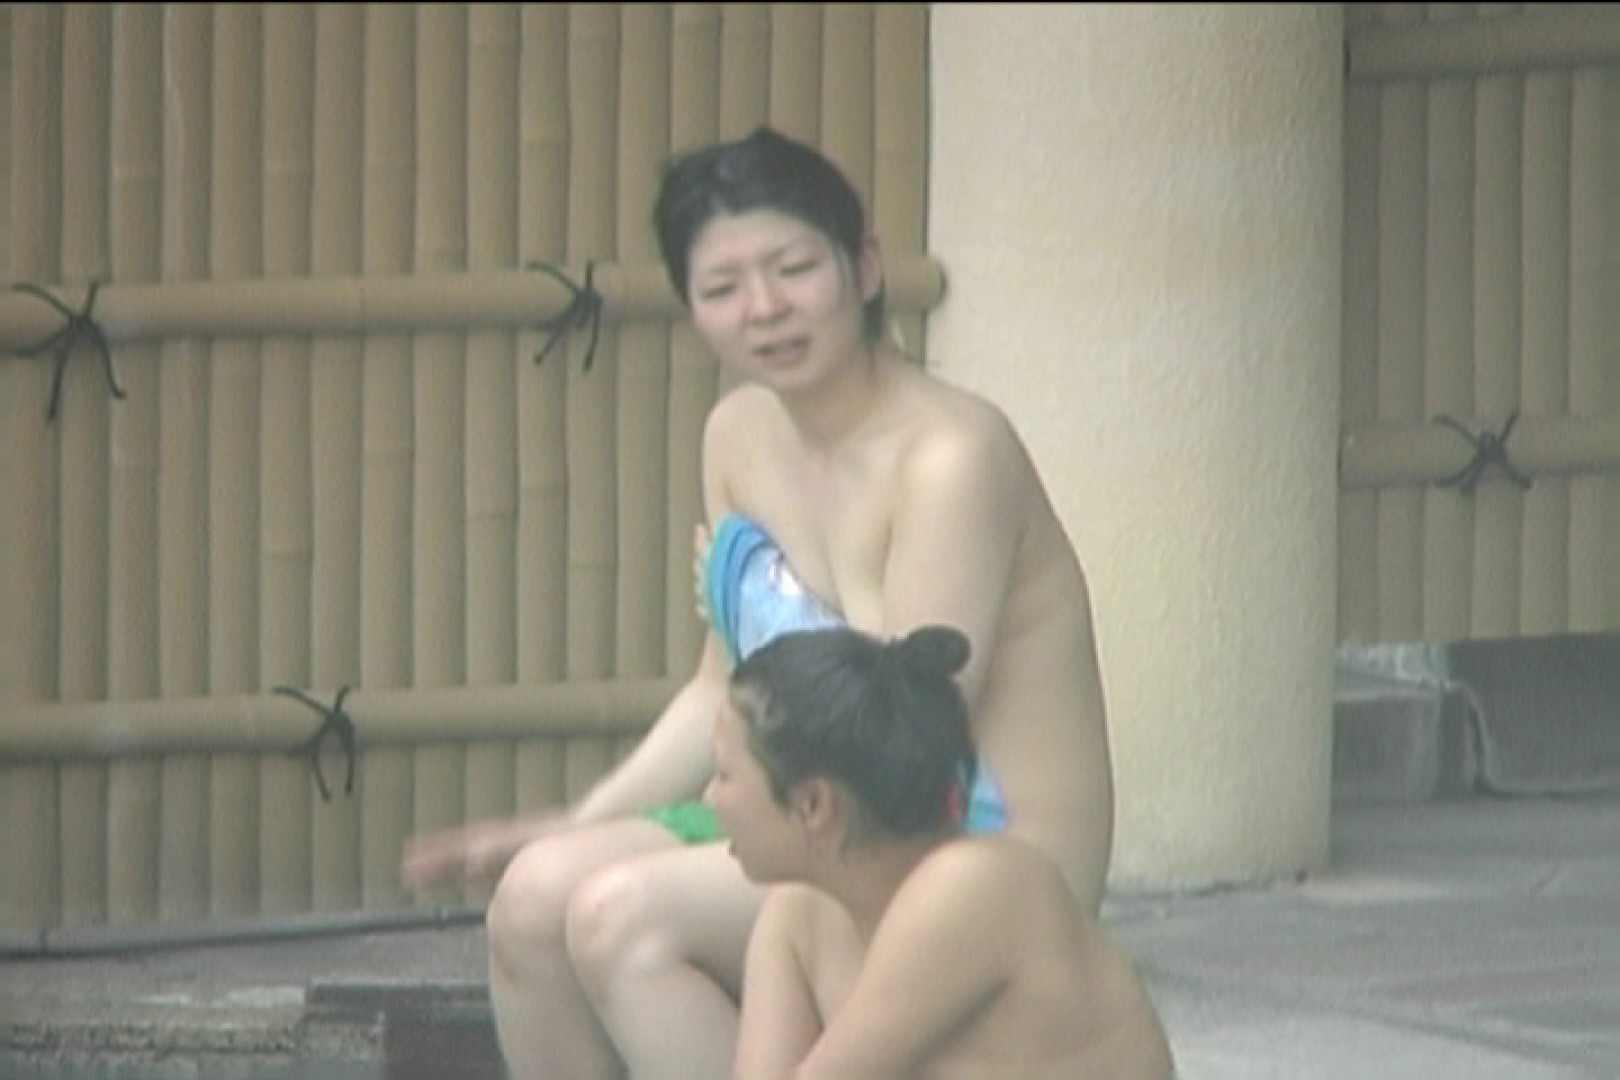 Aquaな露天風呂Vol.139 盗撮シリーズ | 露天風呂編  79PIX 37